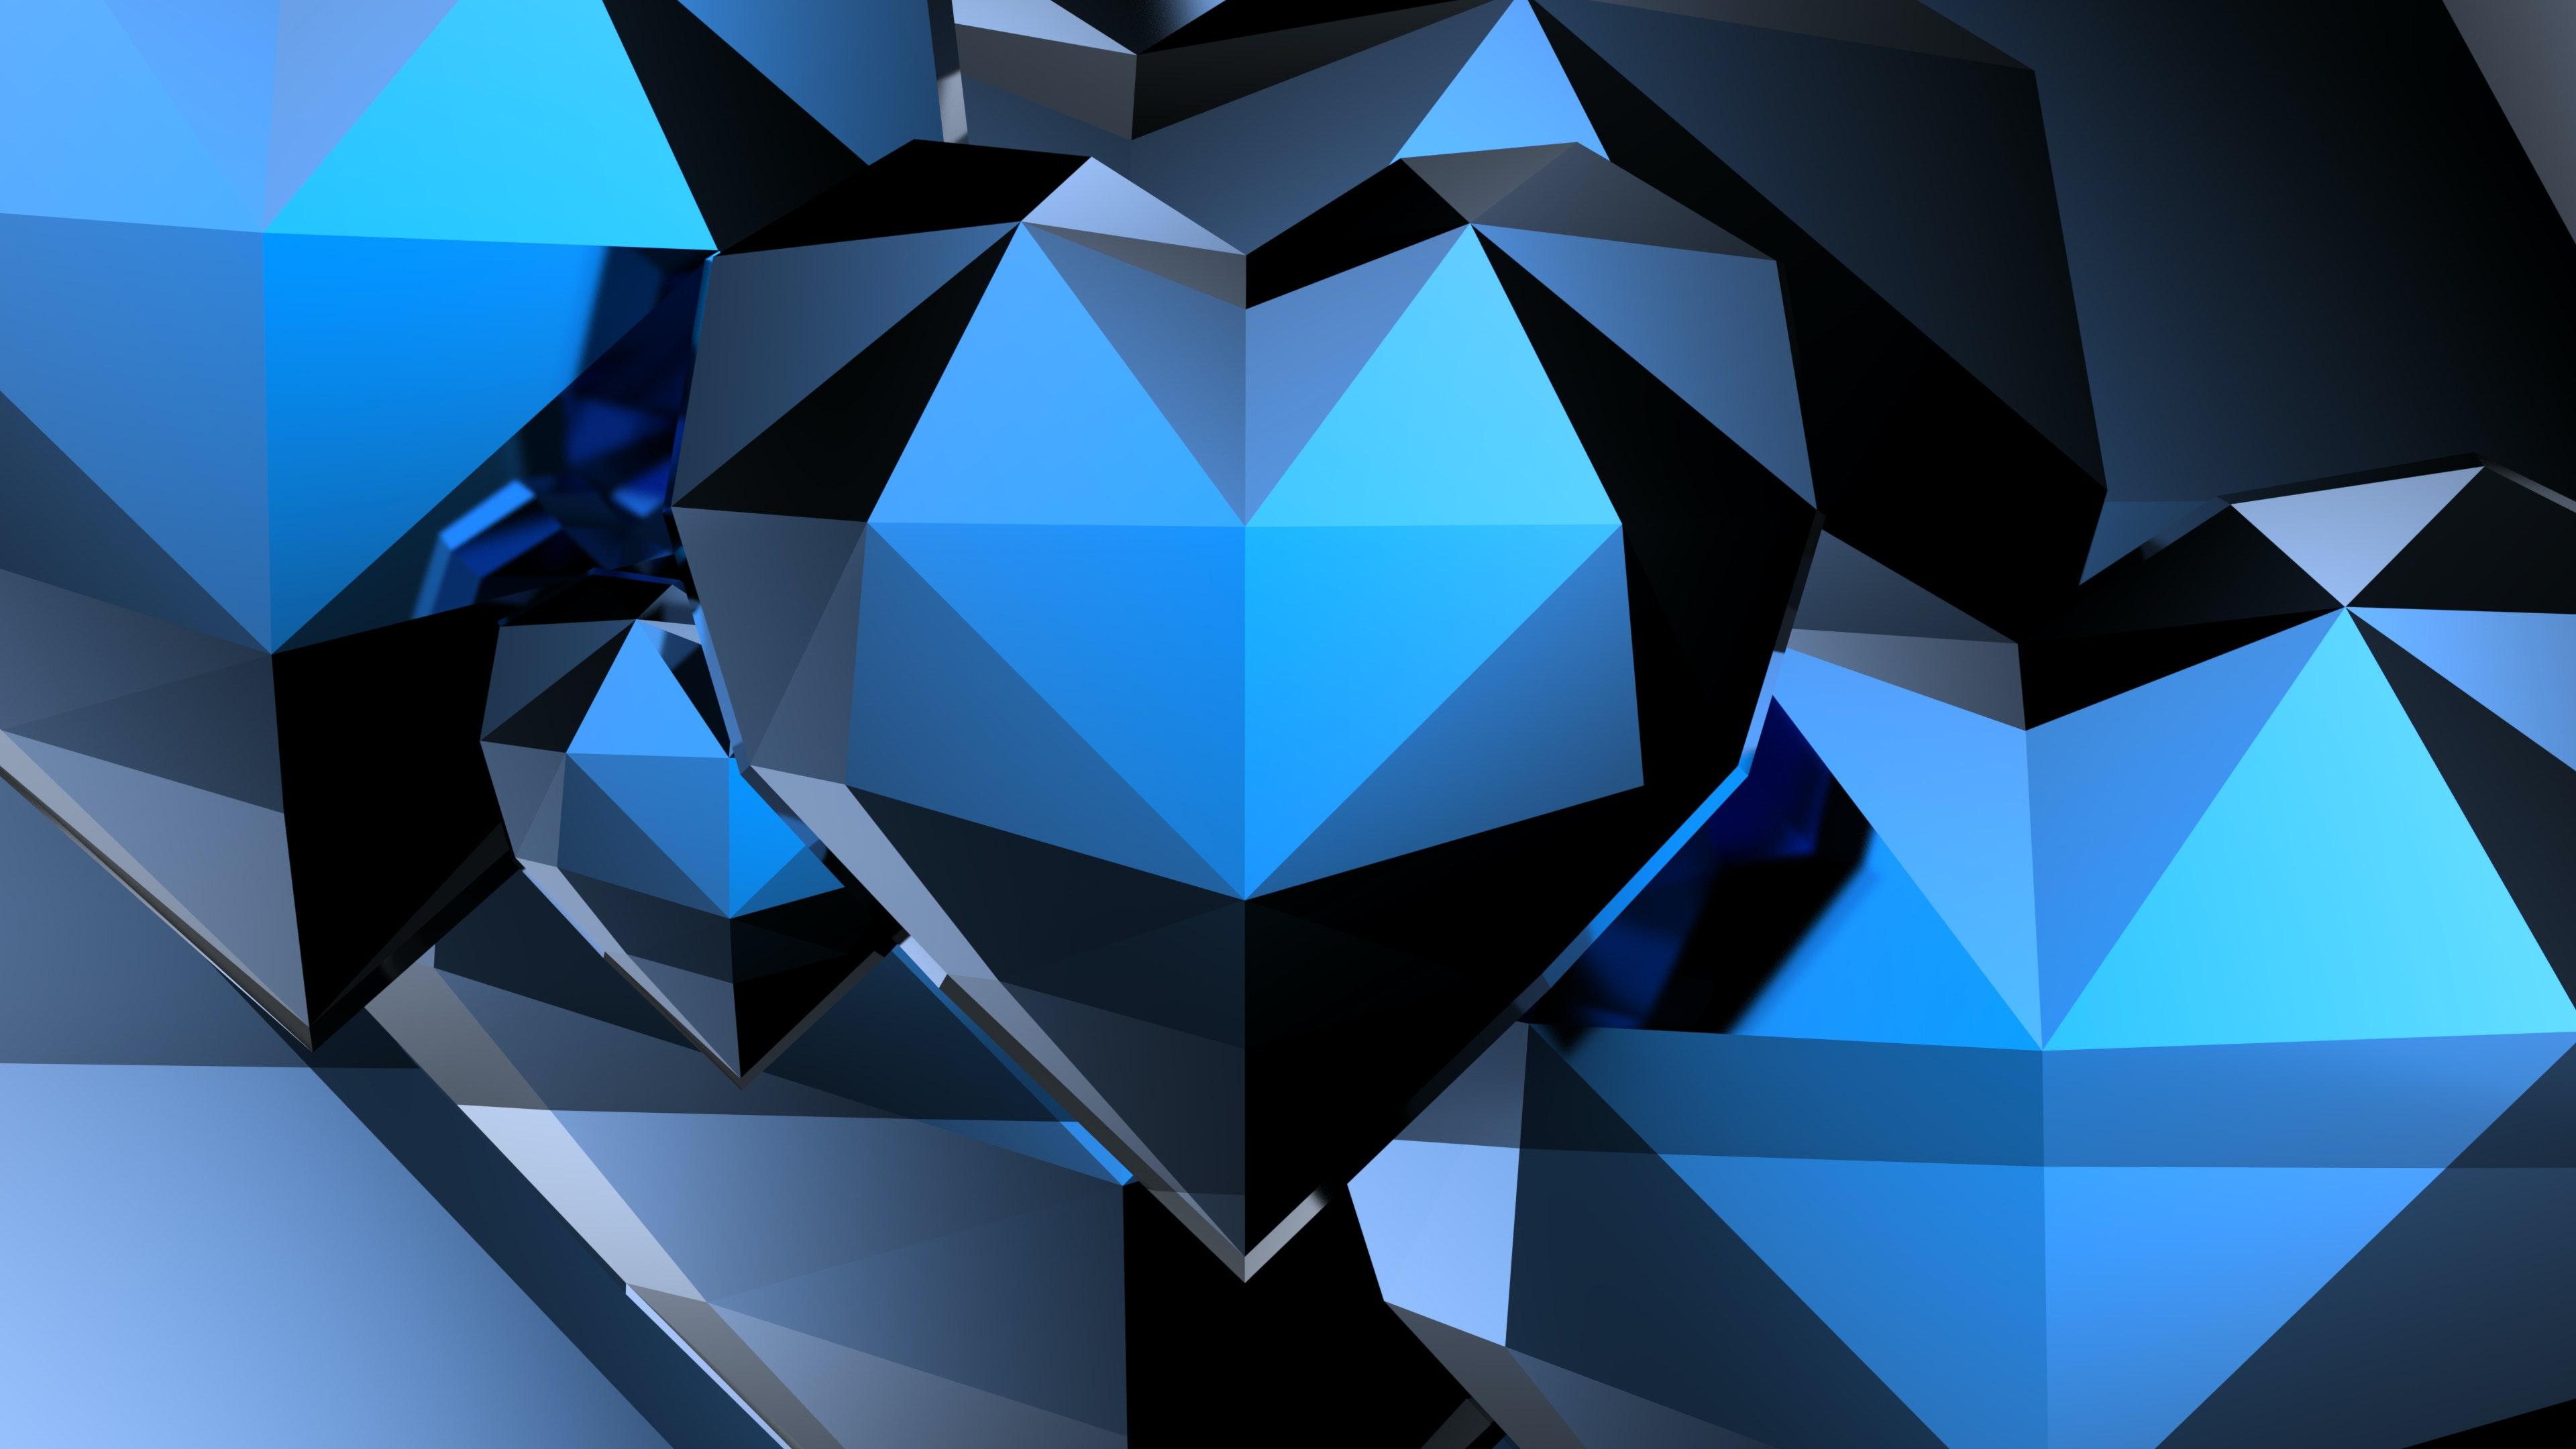 3dハート ハートの壁紙 ブルーハートの無料の写真素材